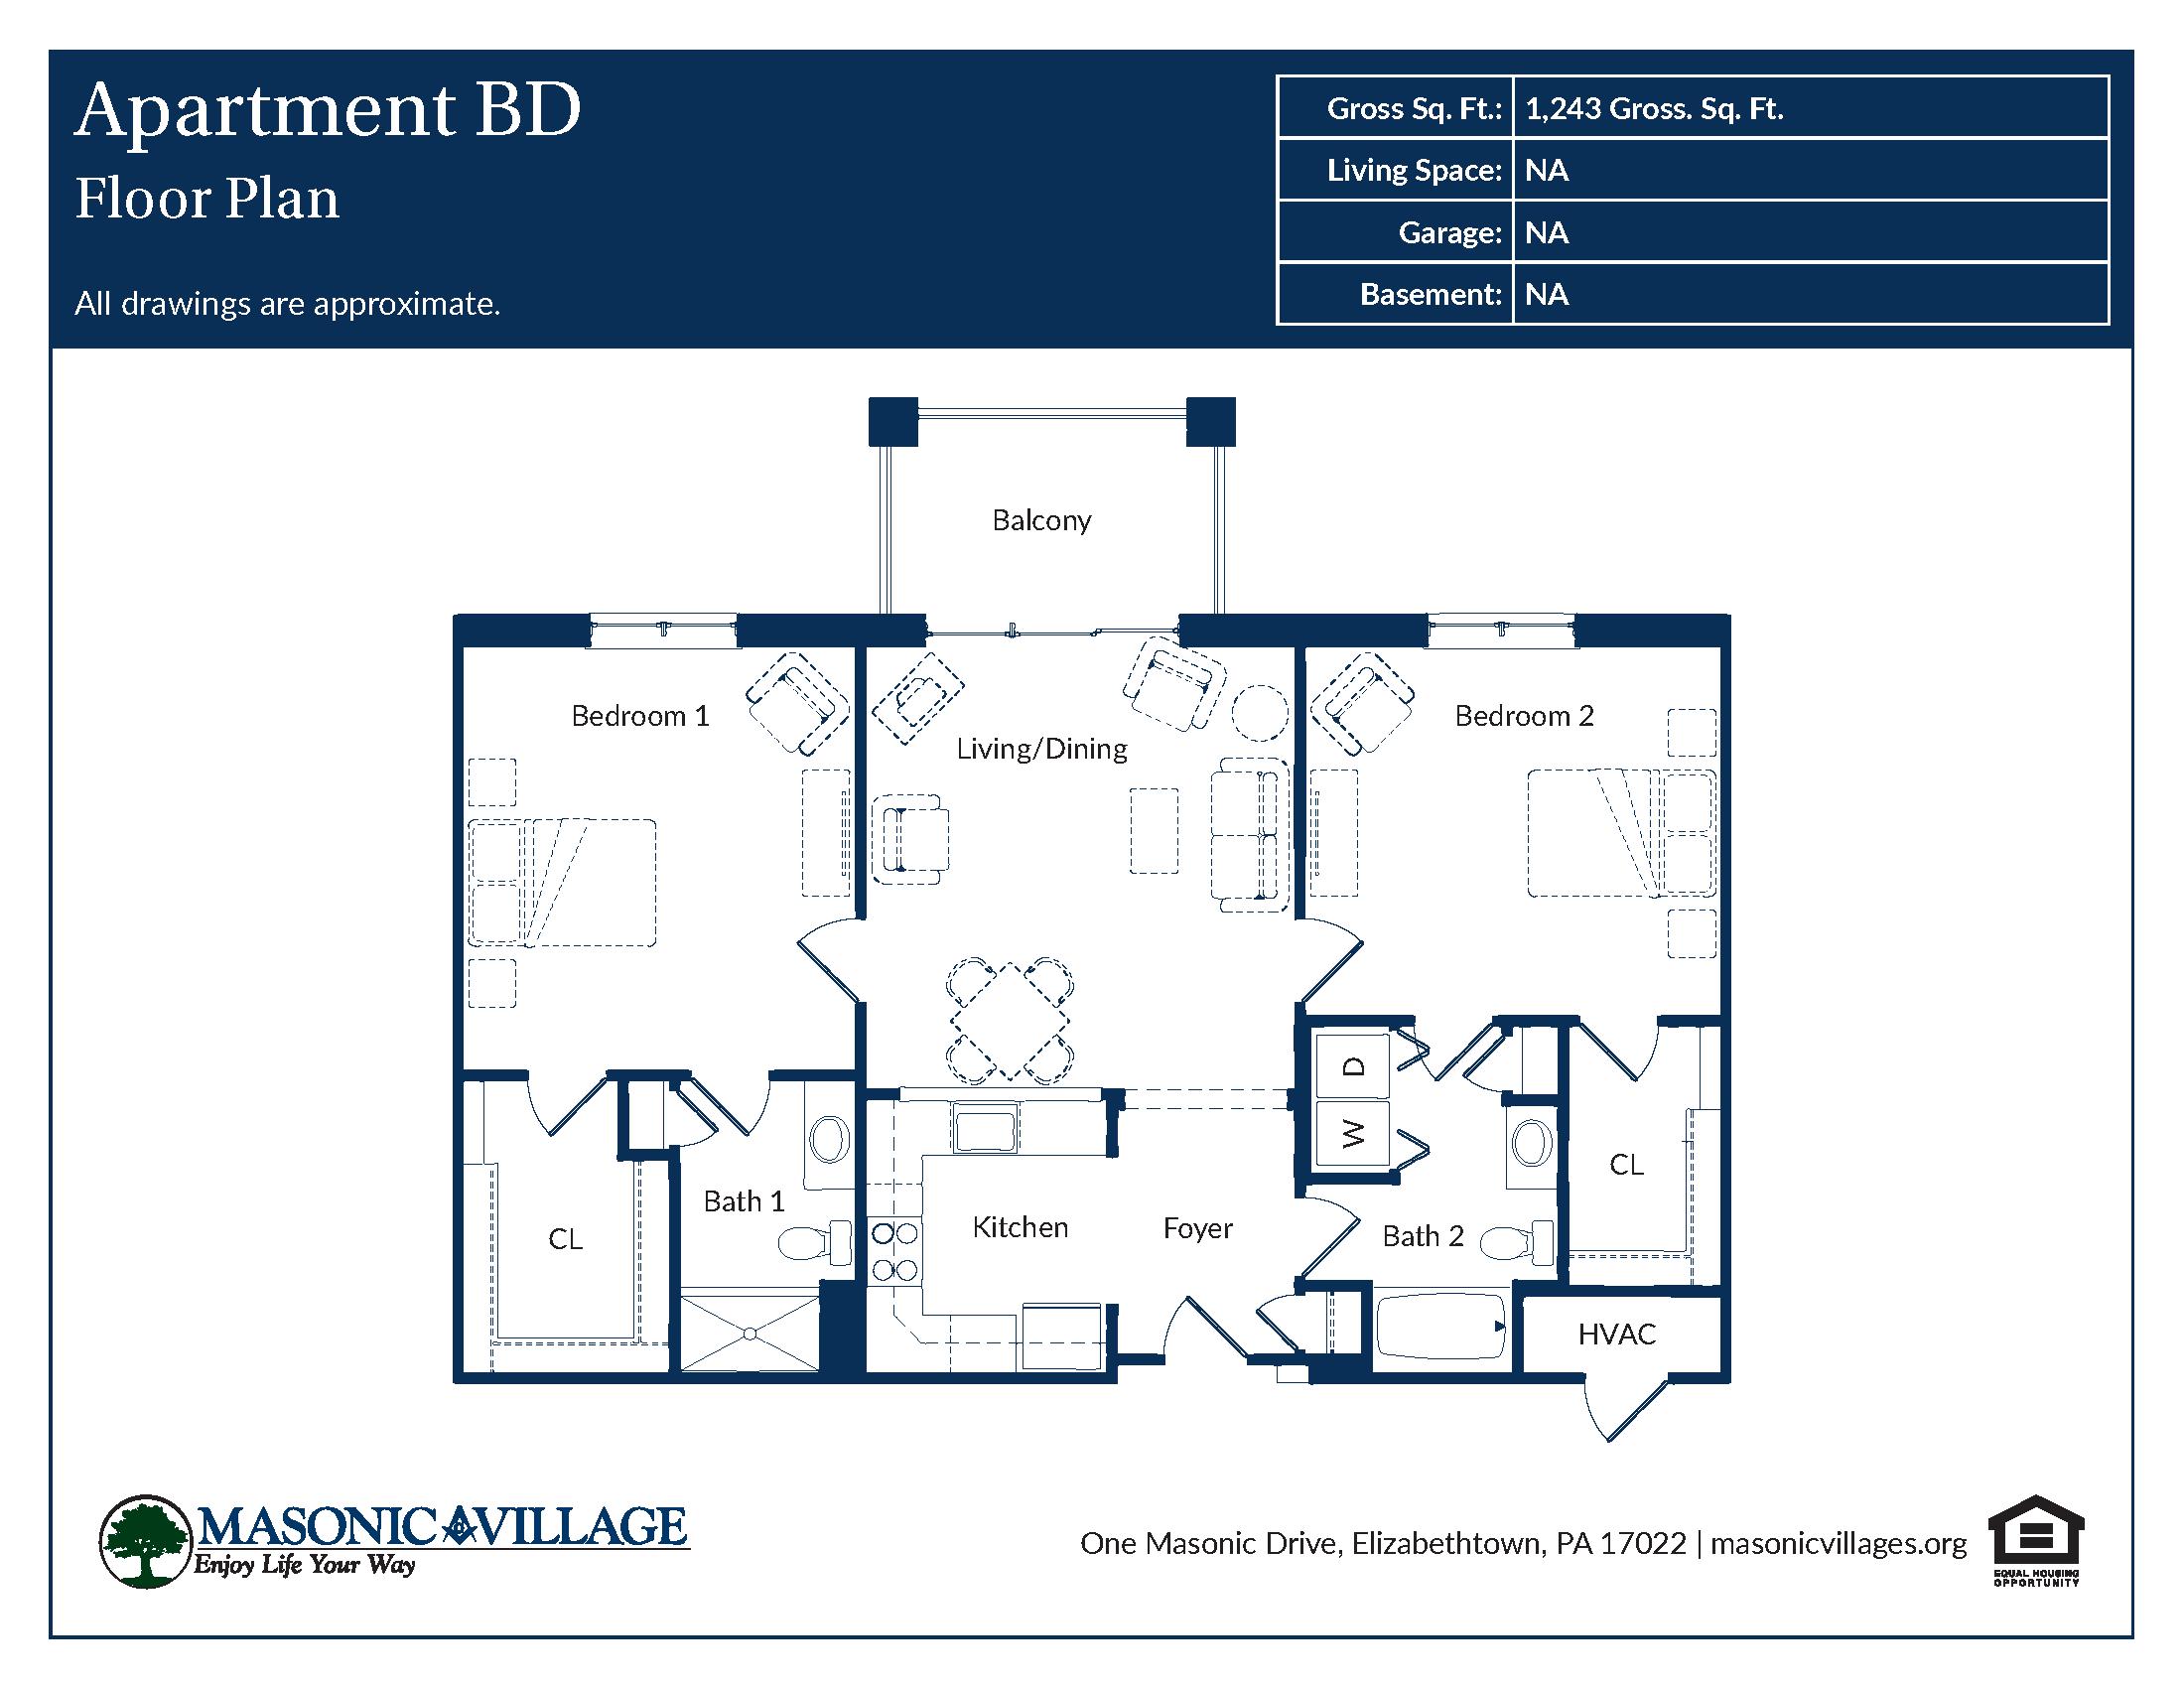 Masonic Village at Elizabethtown - Apartment BD Floor Plan